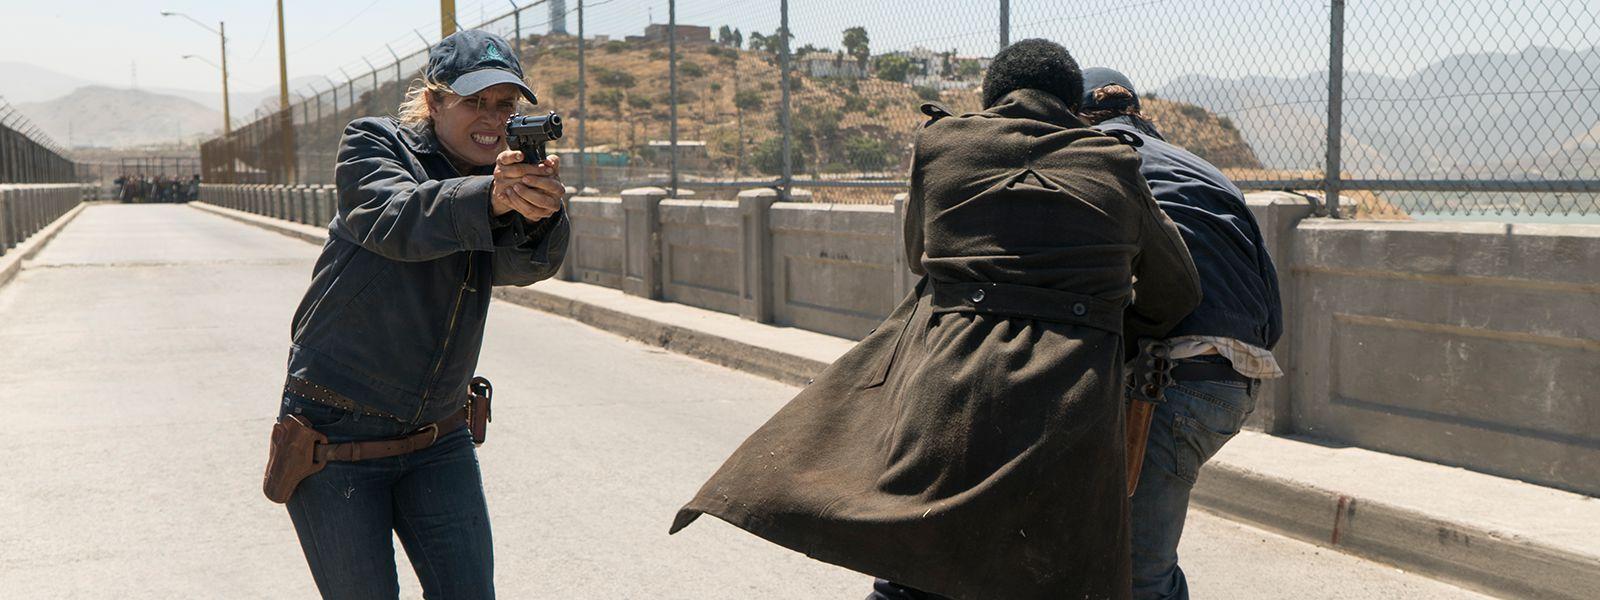 Fear the Walking Dead - Sleigh Ride: Season 3, Episode 16 - AMC